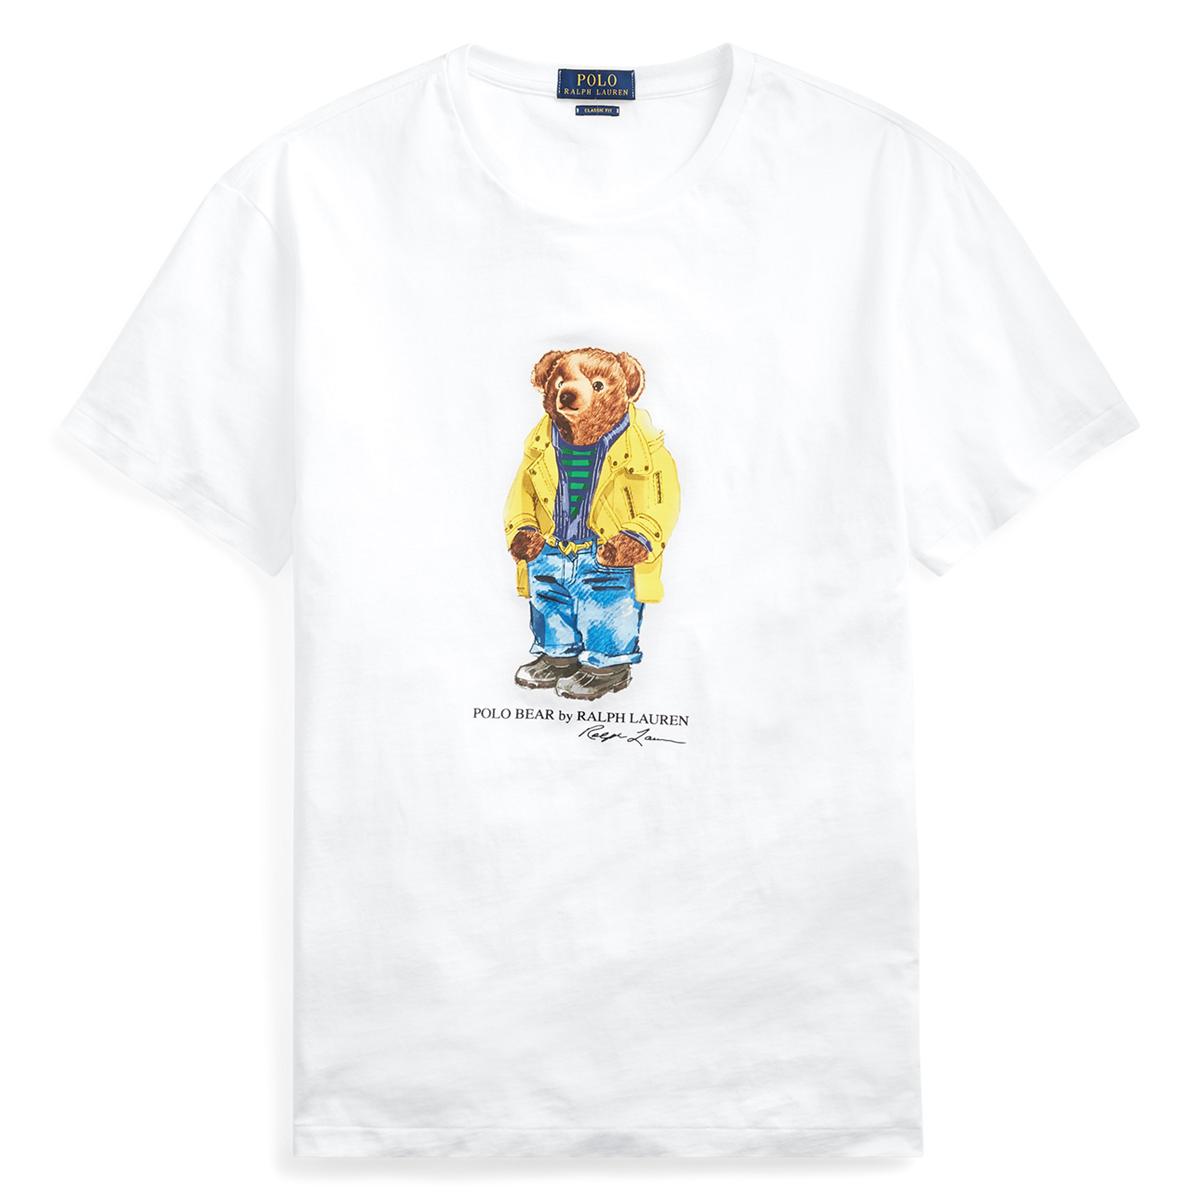 Camiseta Classic Fit con osito Polo 4c19bbfbee2